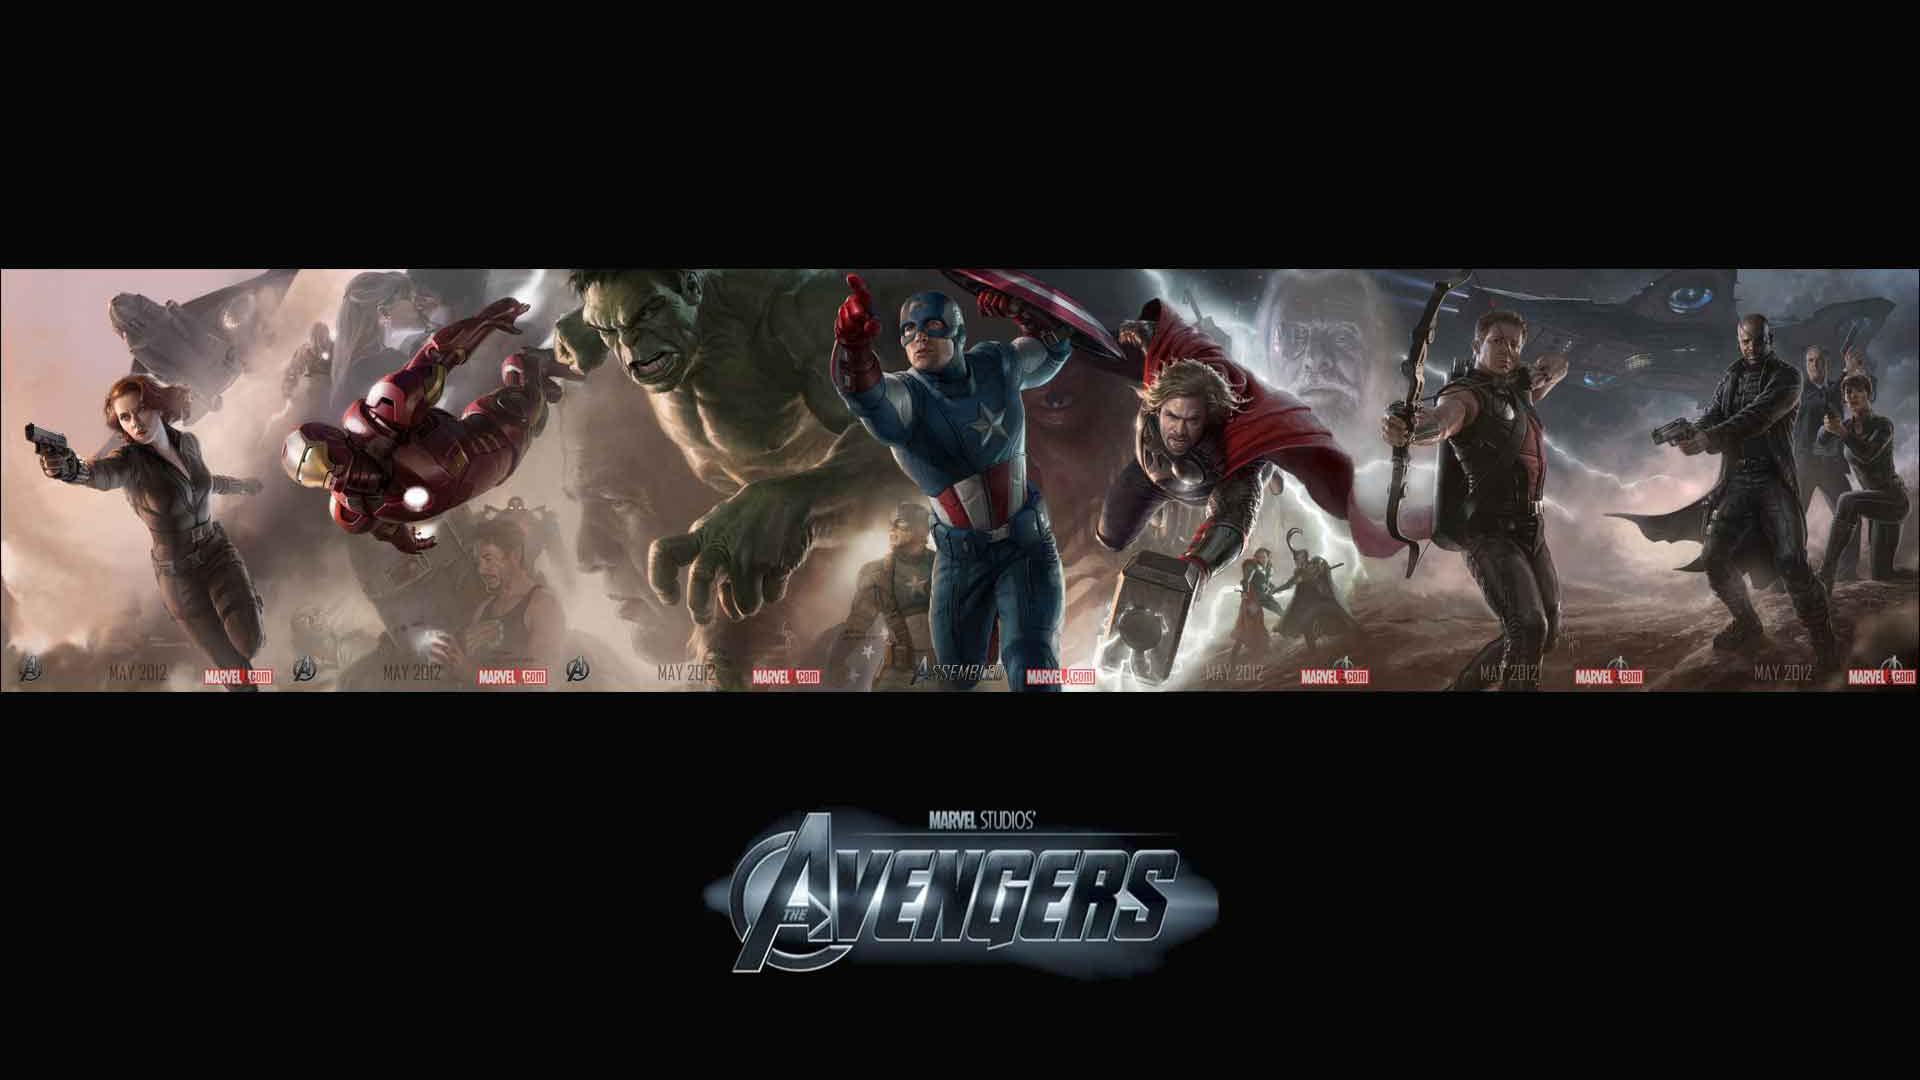 avengers desktop wallpaper wallpapers 1920x1080 1920x1080